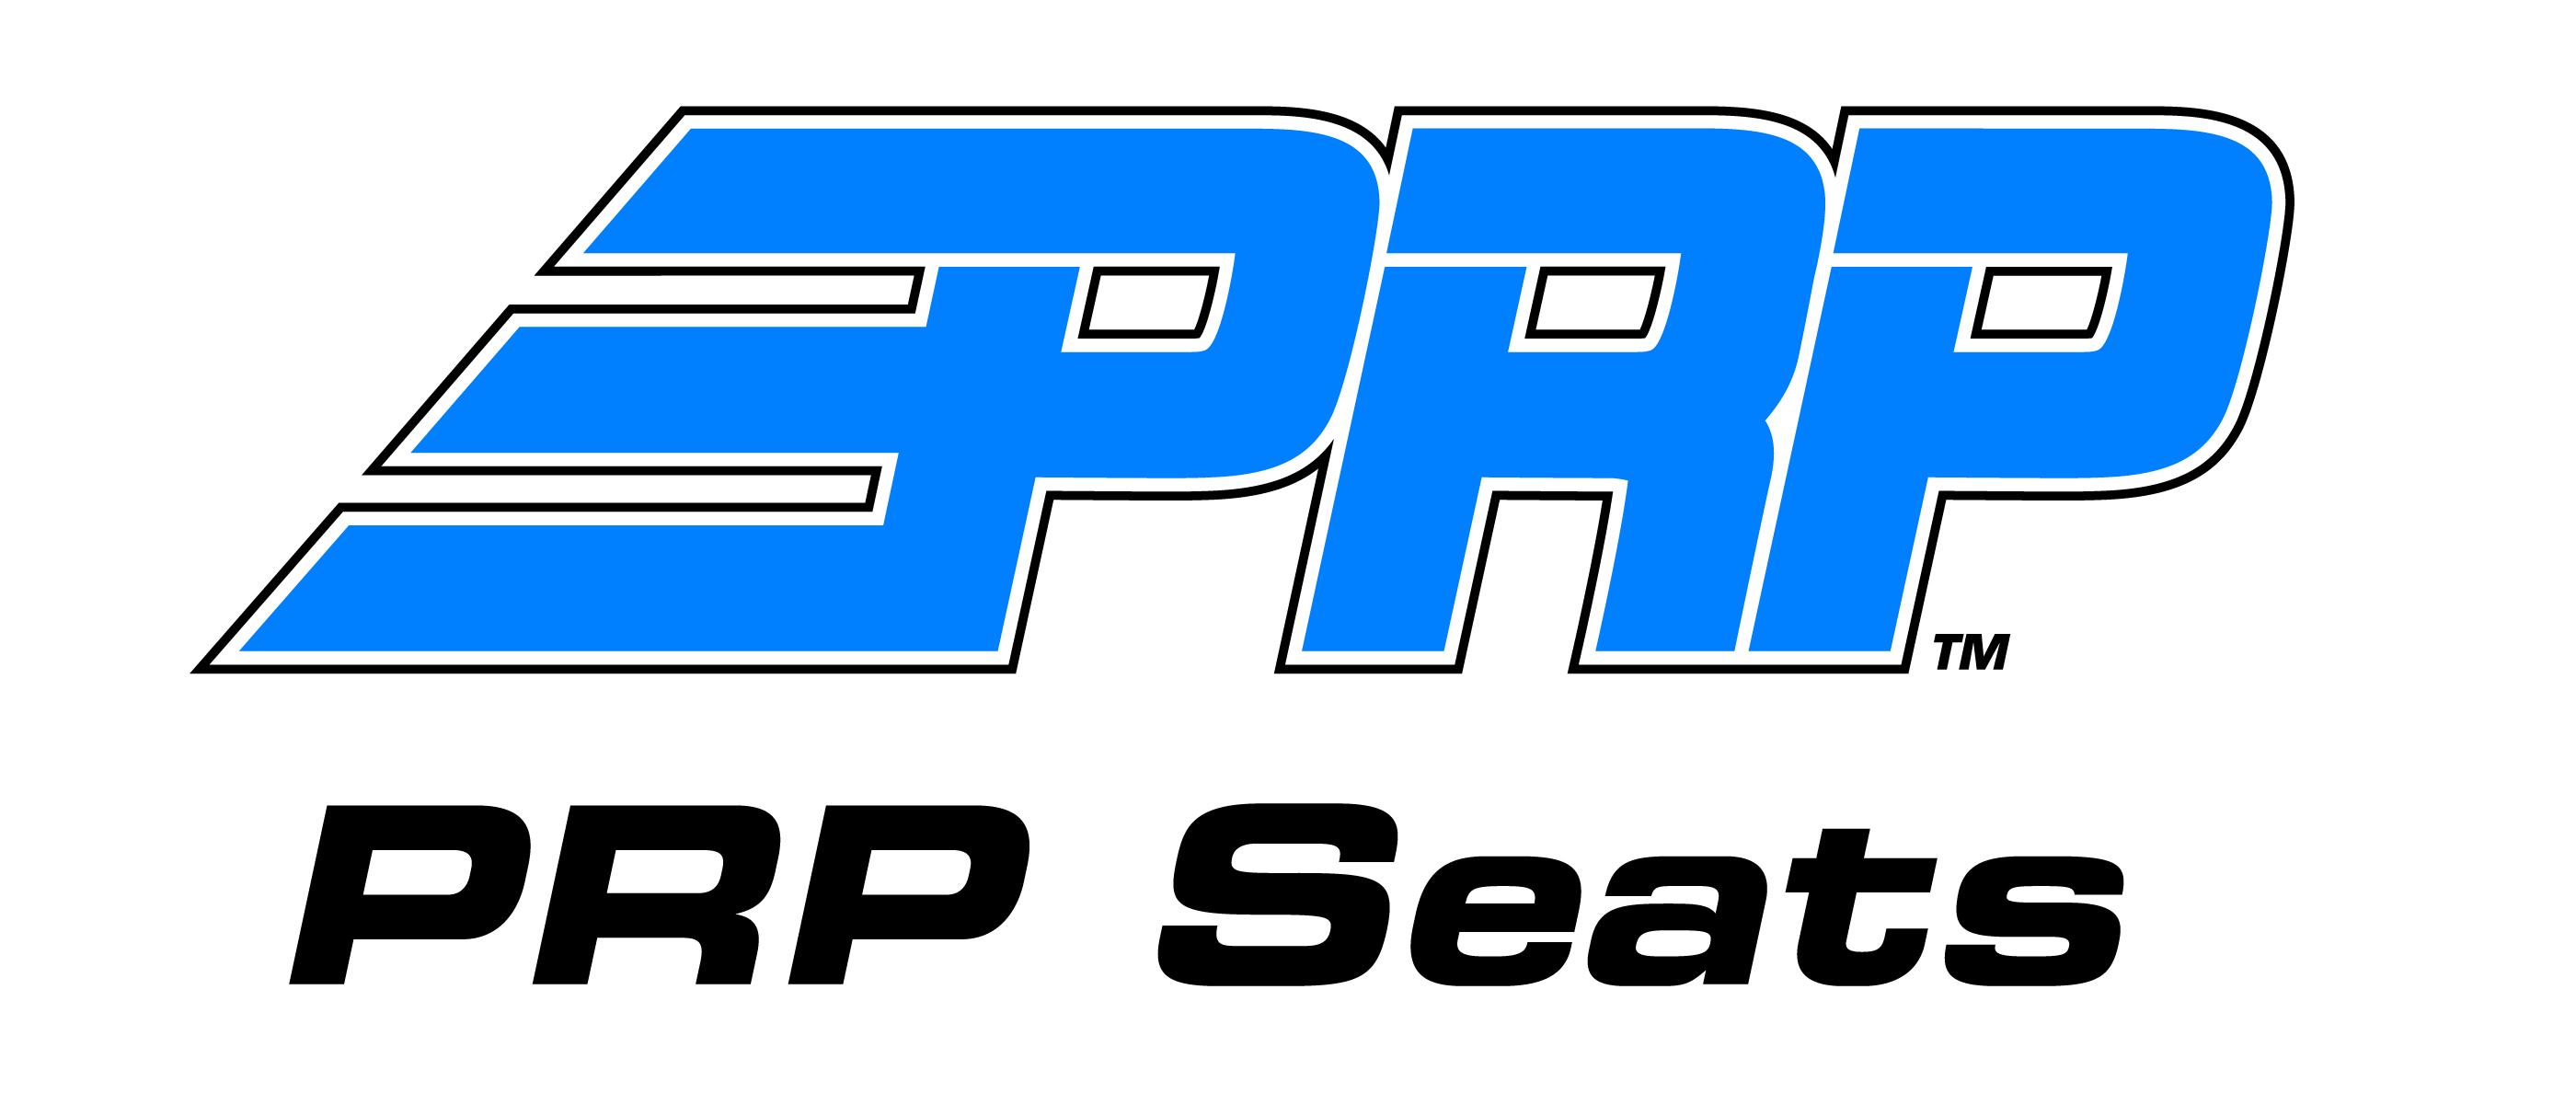 PRP_SEATS_LOGO